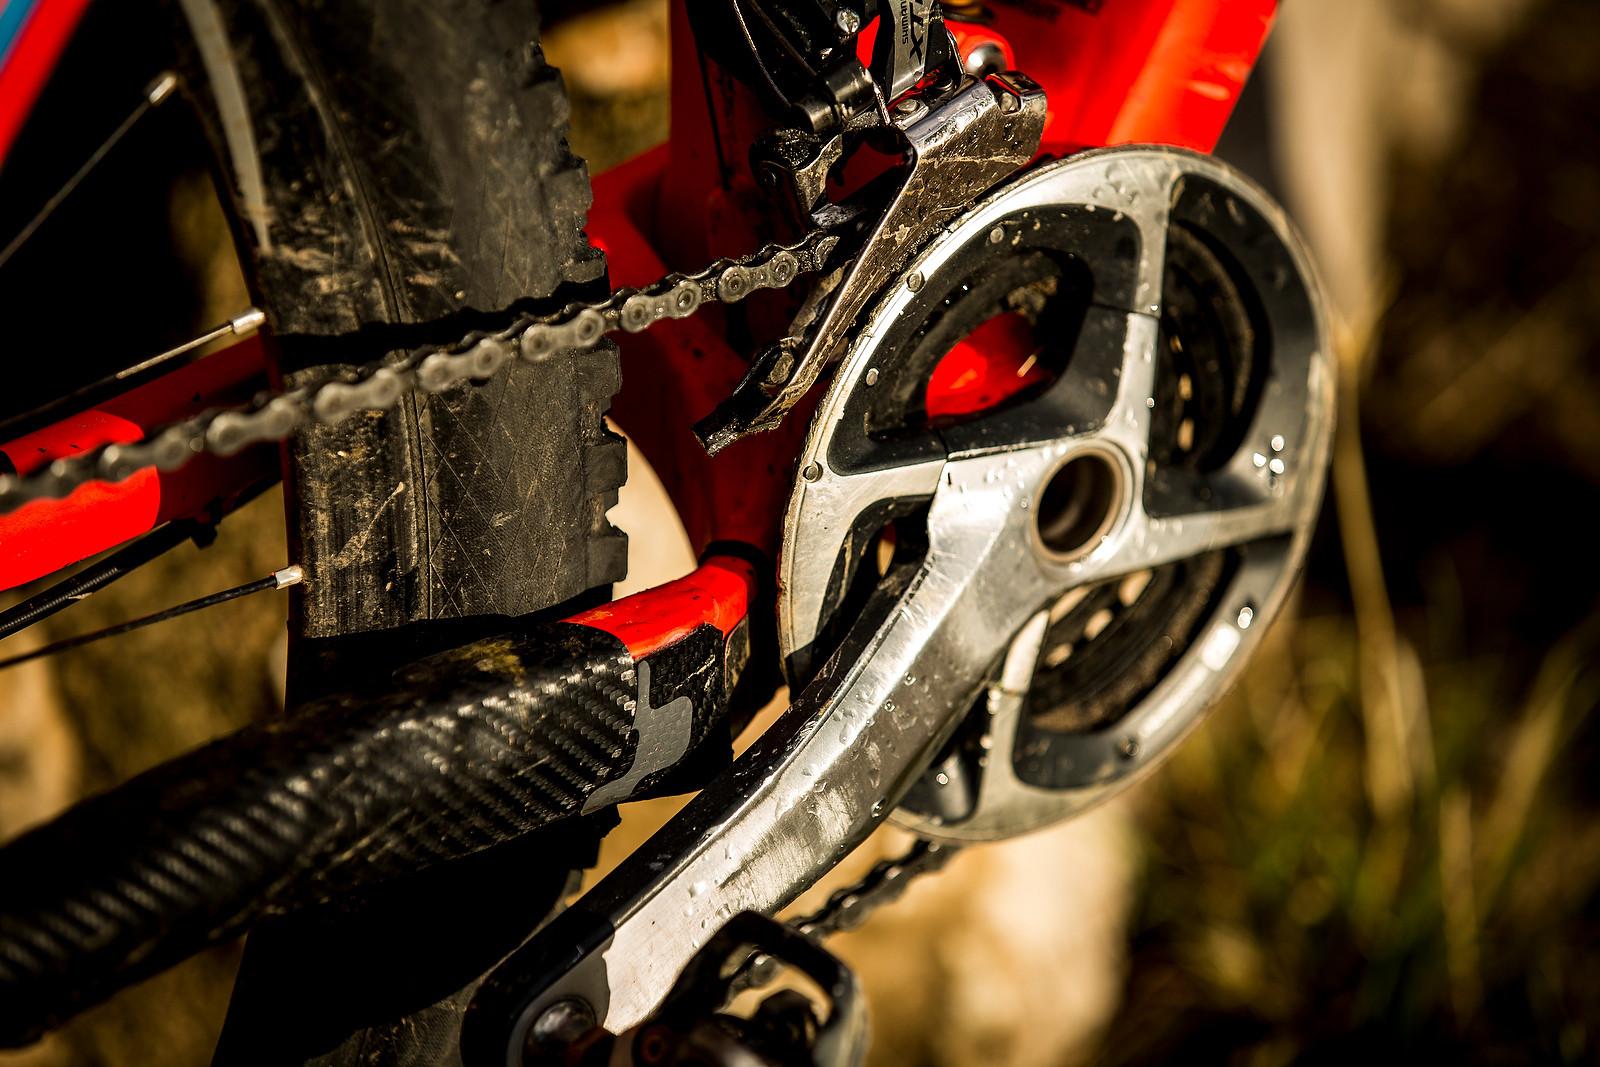 WINNING BIKE: Nico Lau's Cube Stereo 160 Super HPC 27.5 - WINNING BIKE: Nico Lau's Cube Stereo 160 Super HPC 27.5 - Mountain Biking Pictures - Vital MTB